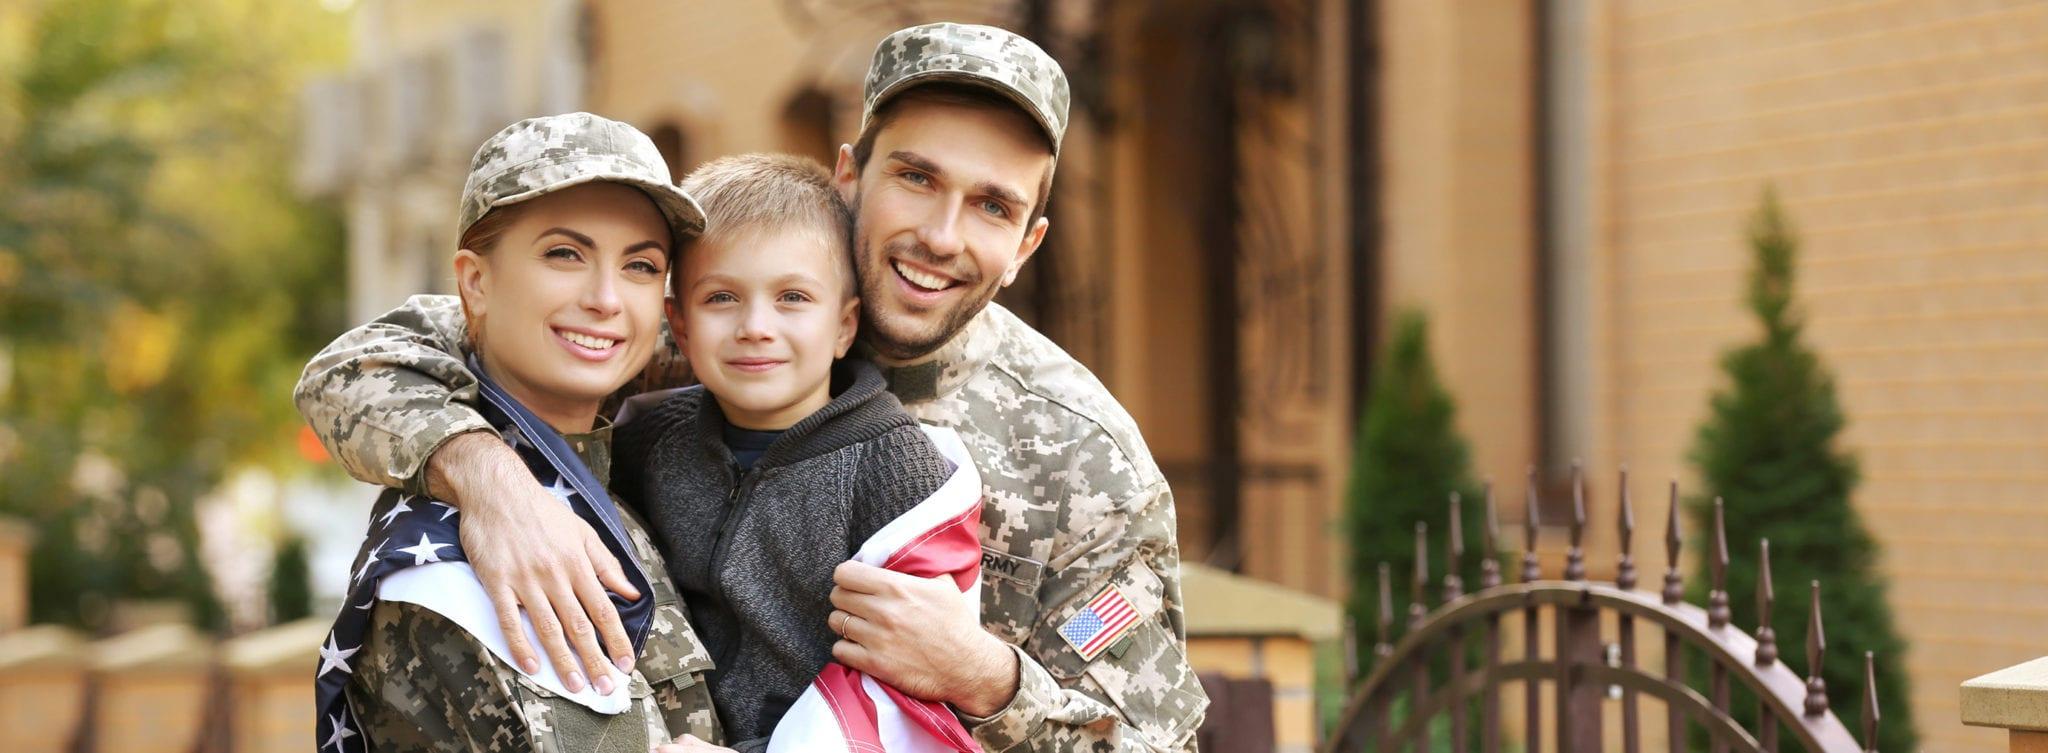 Military Bankruptcy - Chesapeake, Virginia Beach, Norfolk, Newport News, Hampton, Chesterfield, Richmond